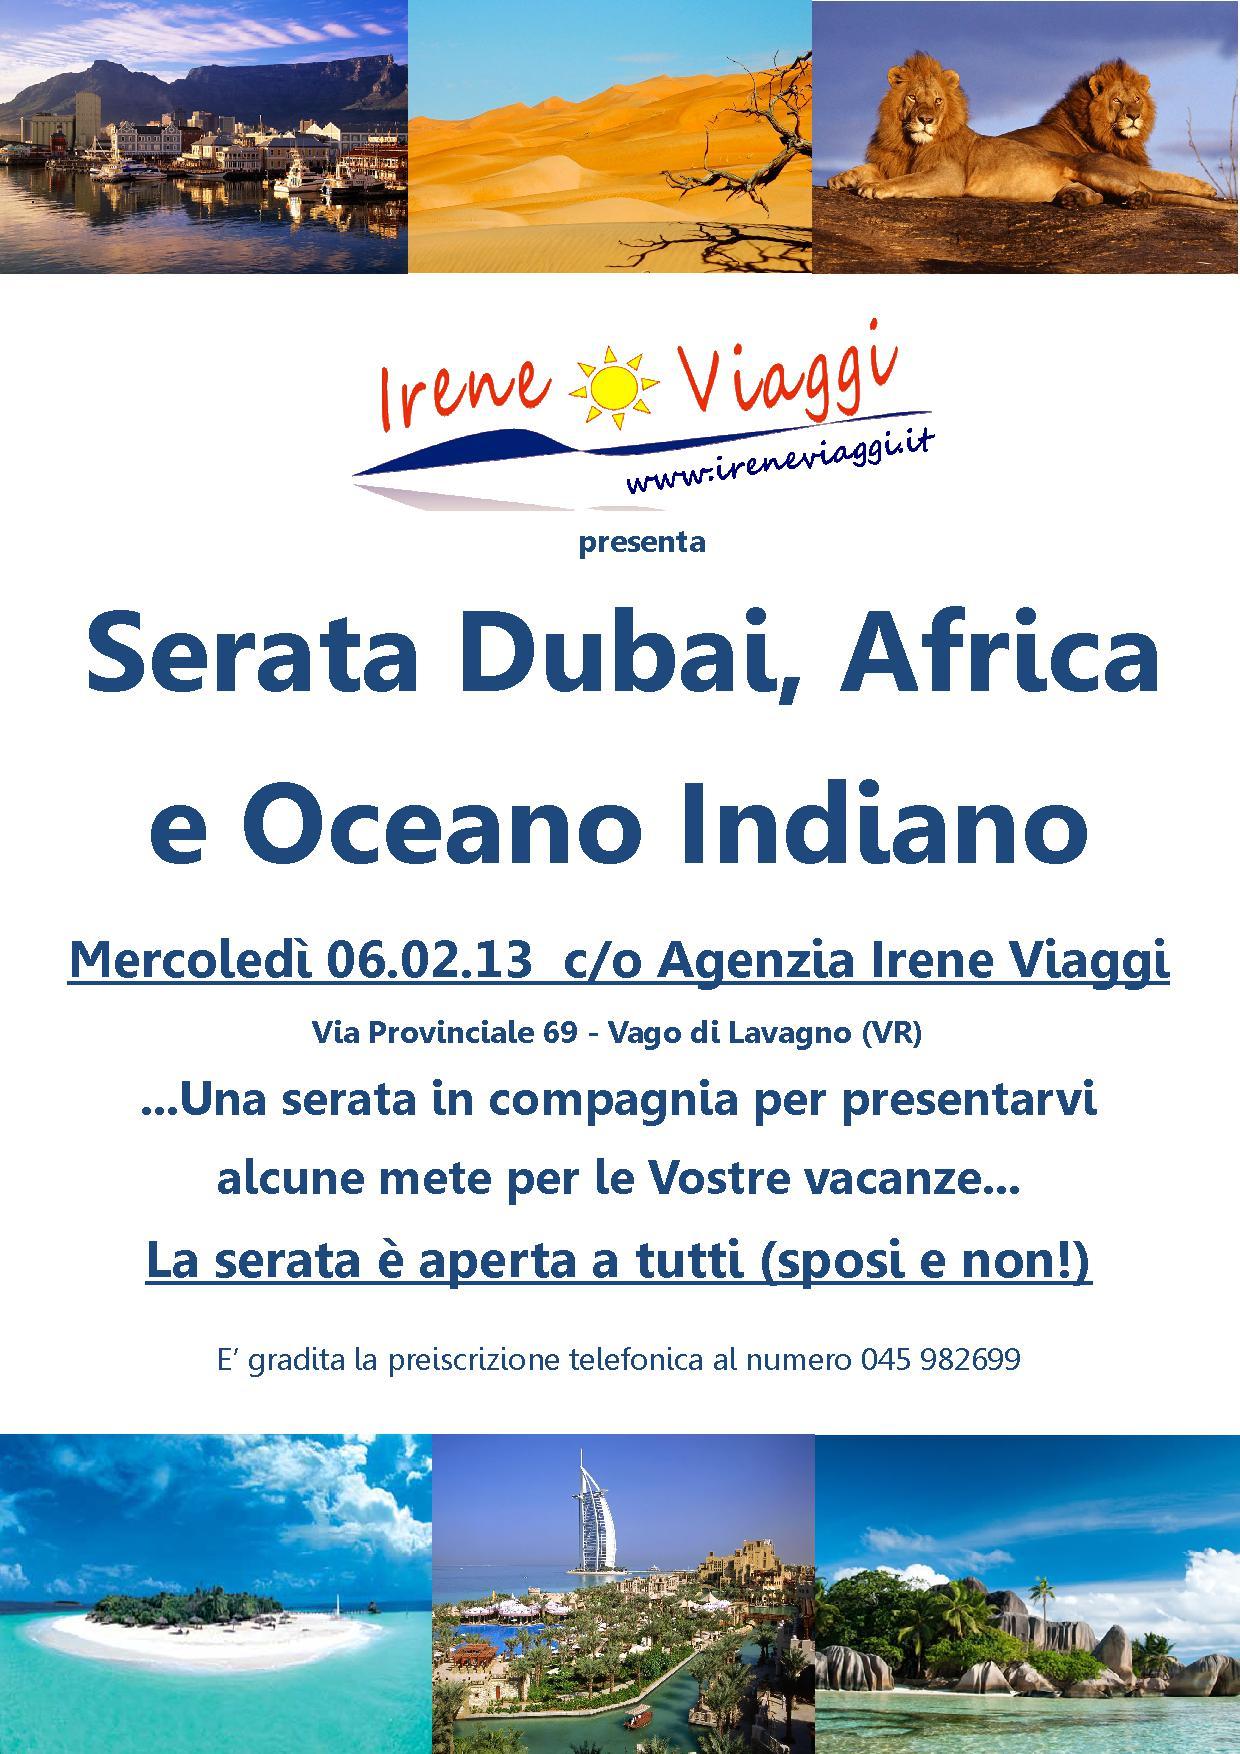 Serata Emirati Africa e Oceano Indiano